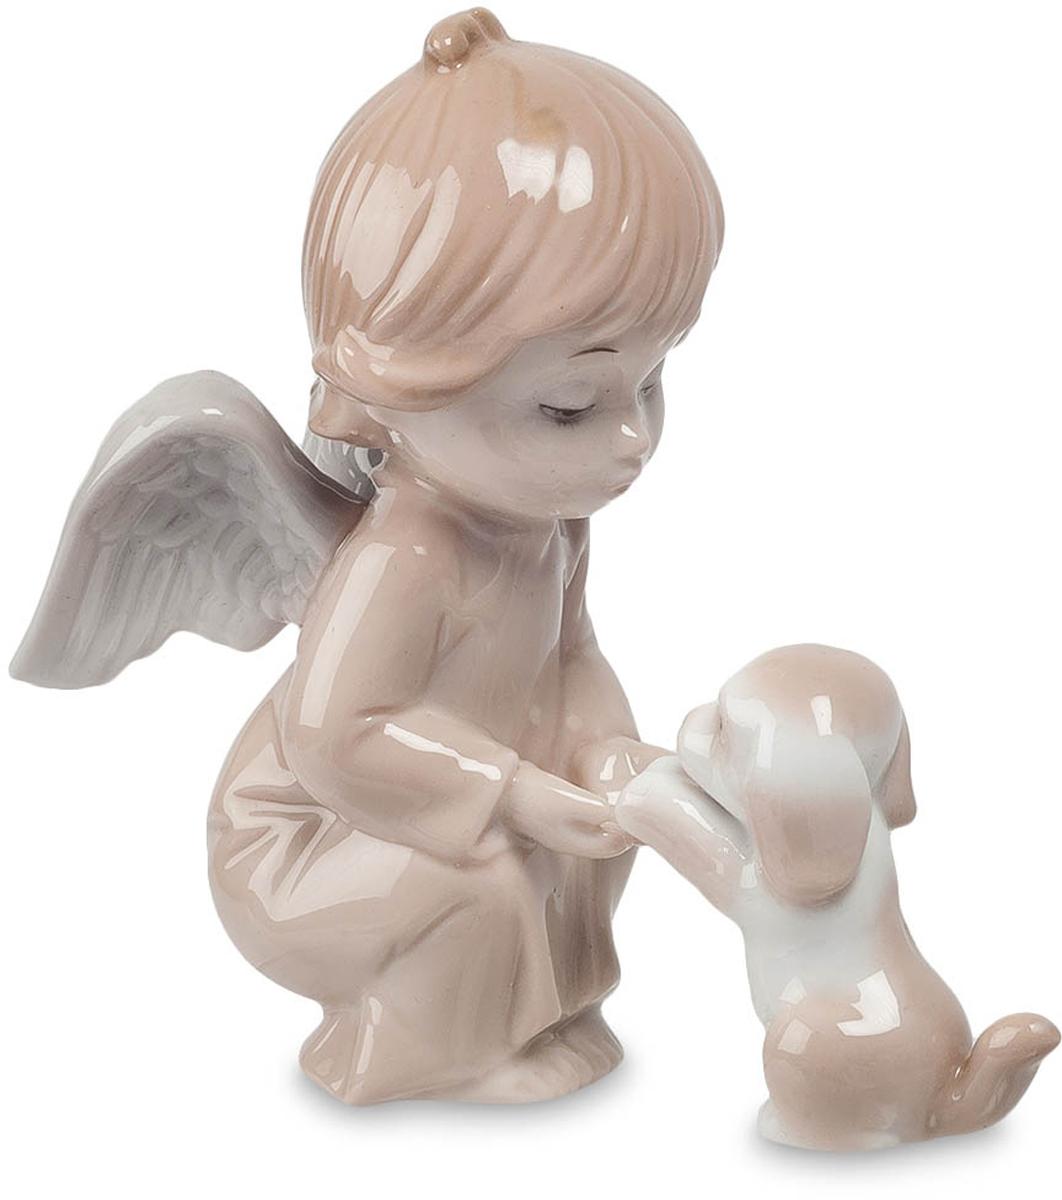 Фигурка декоративная Pavone Ангел, высота 10,5 см фигурки pavone фигурка ангел pavone